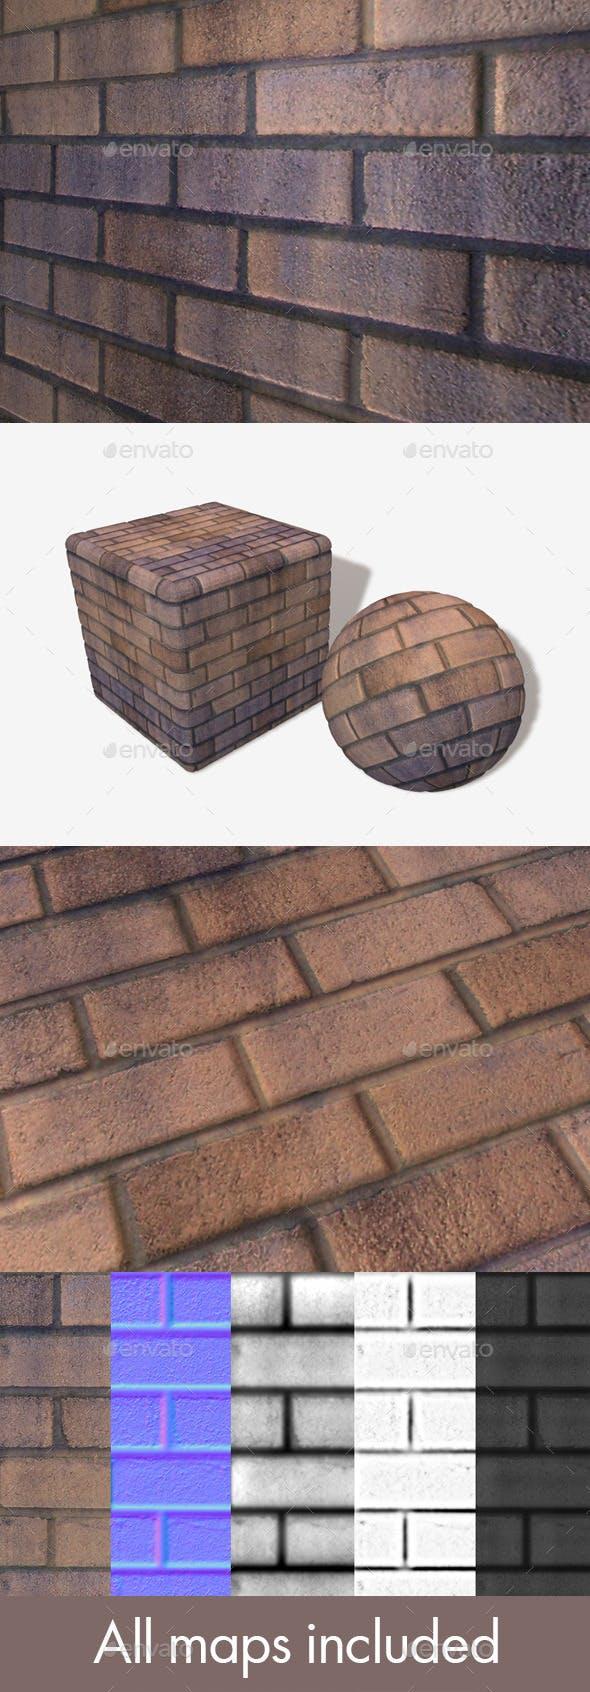 Orange Purple Brick Wall Seamless Texture - 3DOcean Item for Sale